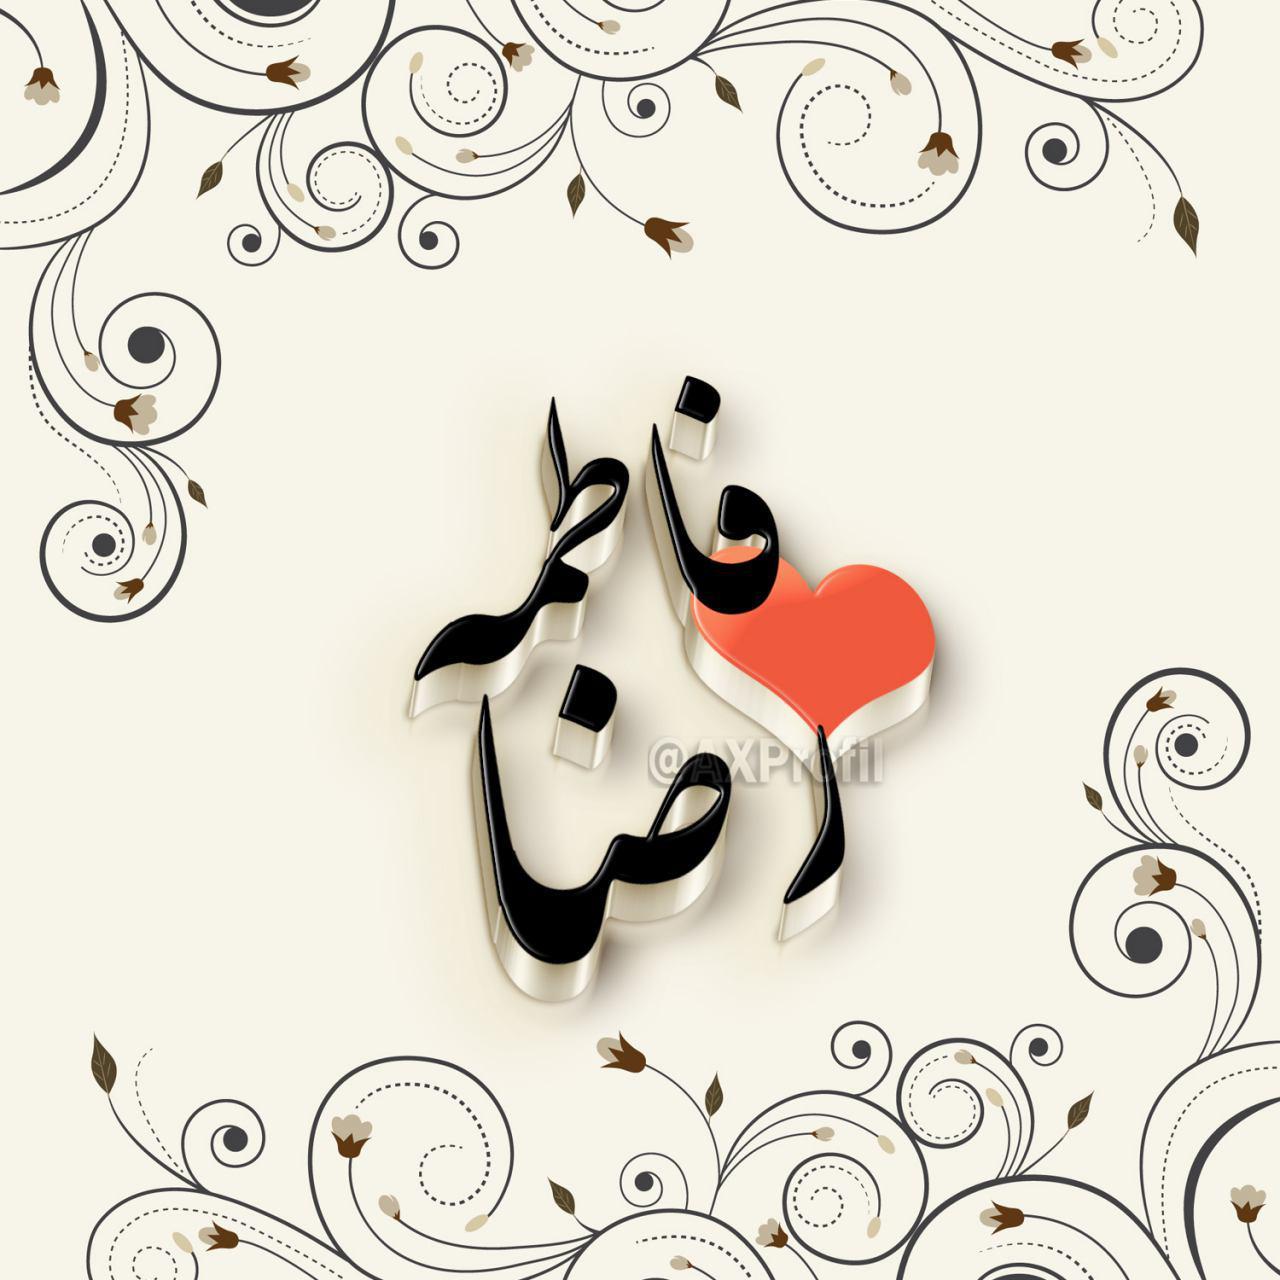 طرح گرافیکی لوگو اسم عاشقانه اسم رضا و فاطمه